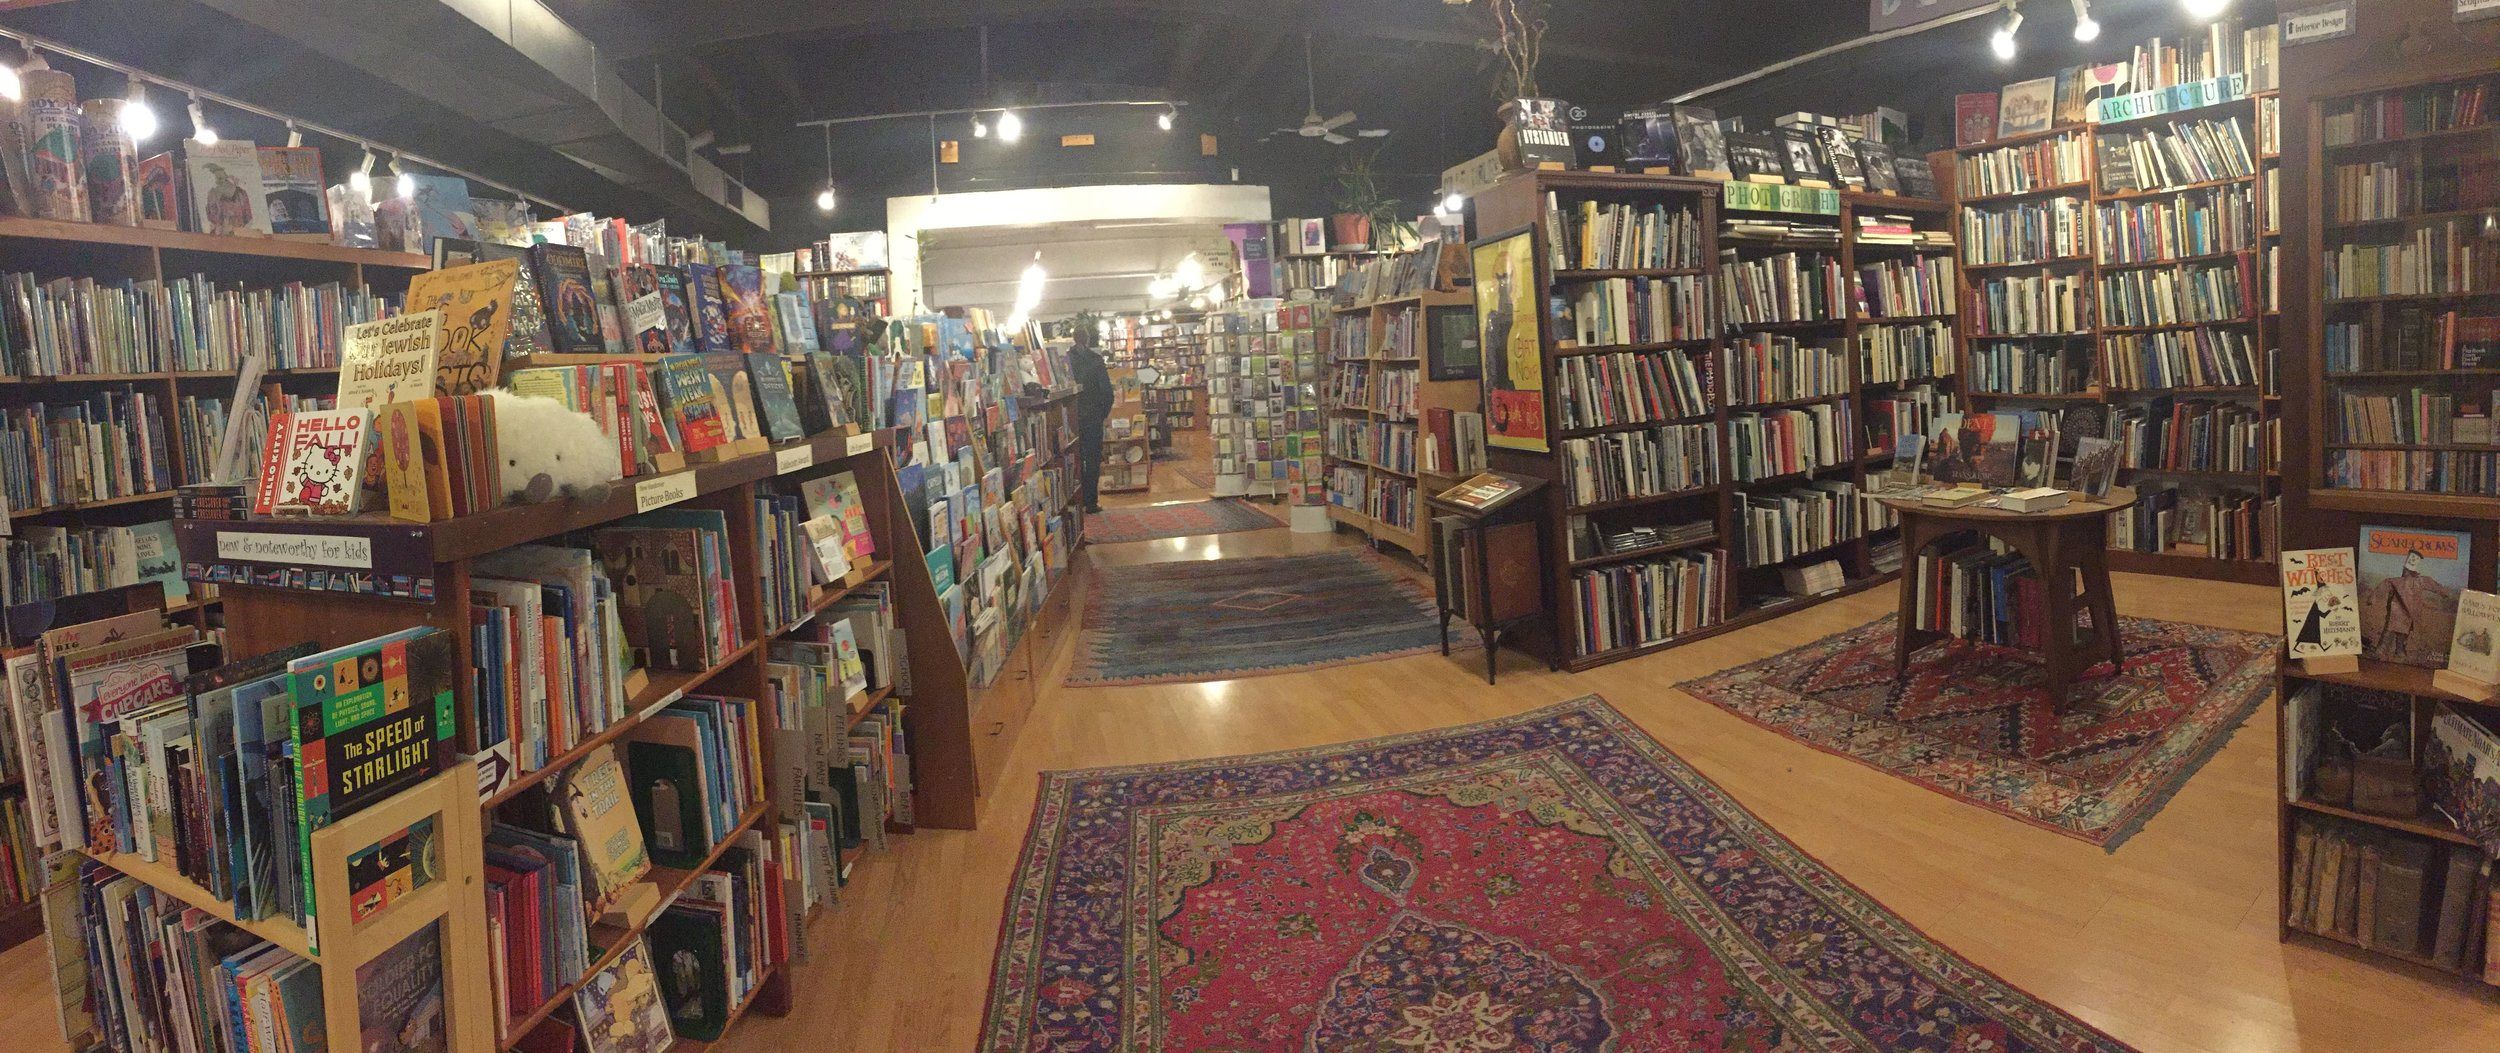 Loganberry Books interior